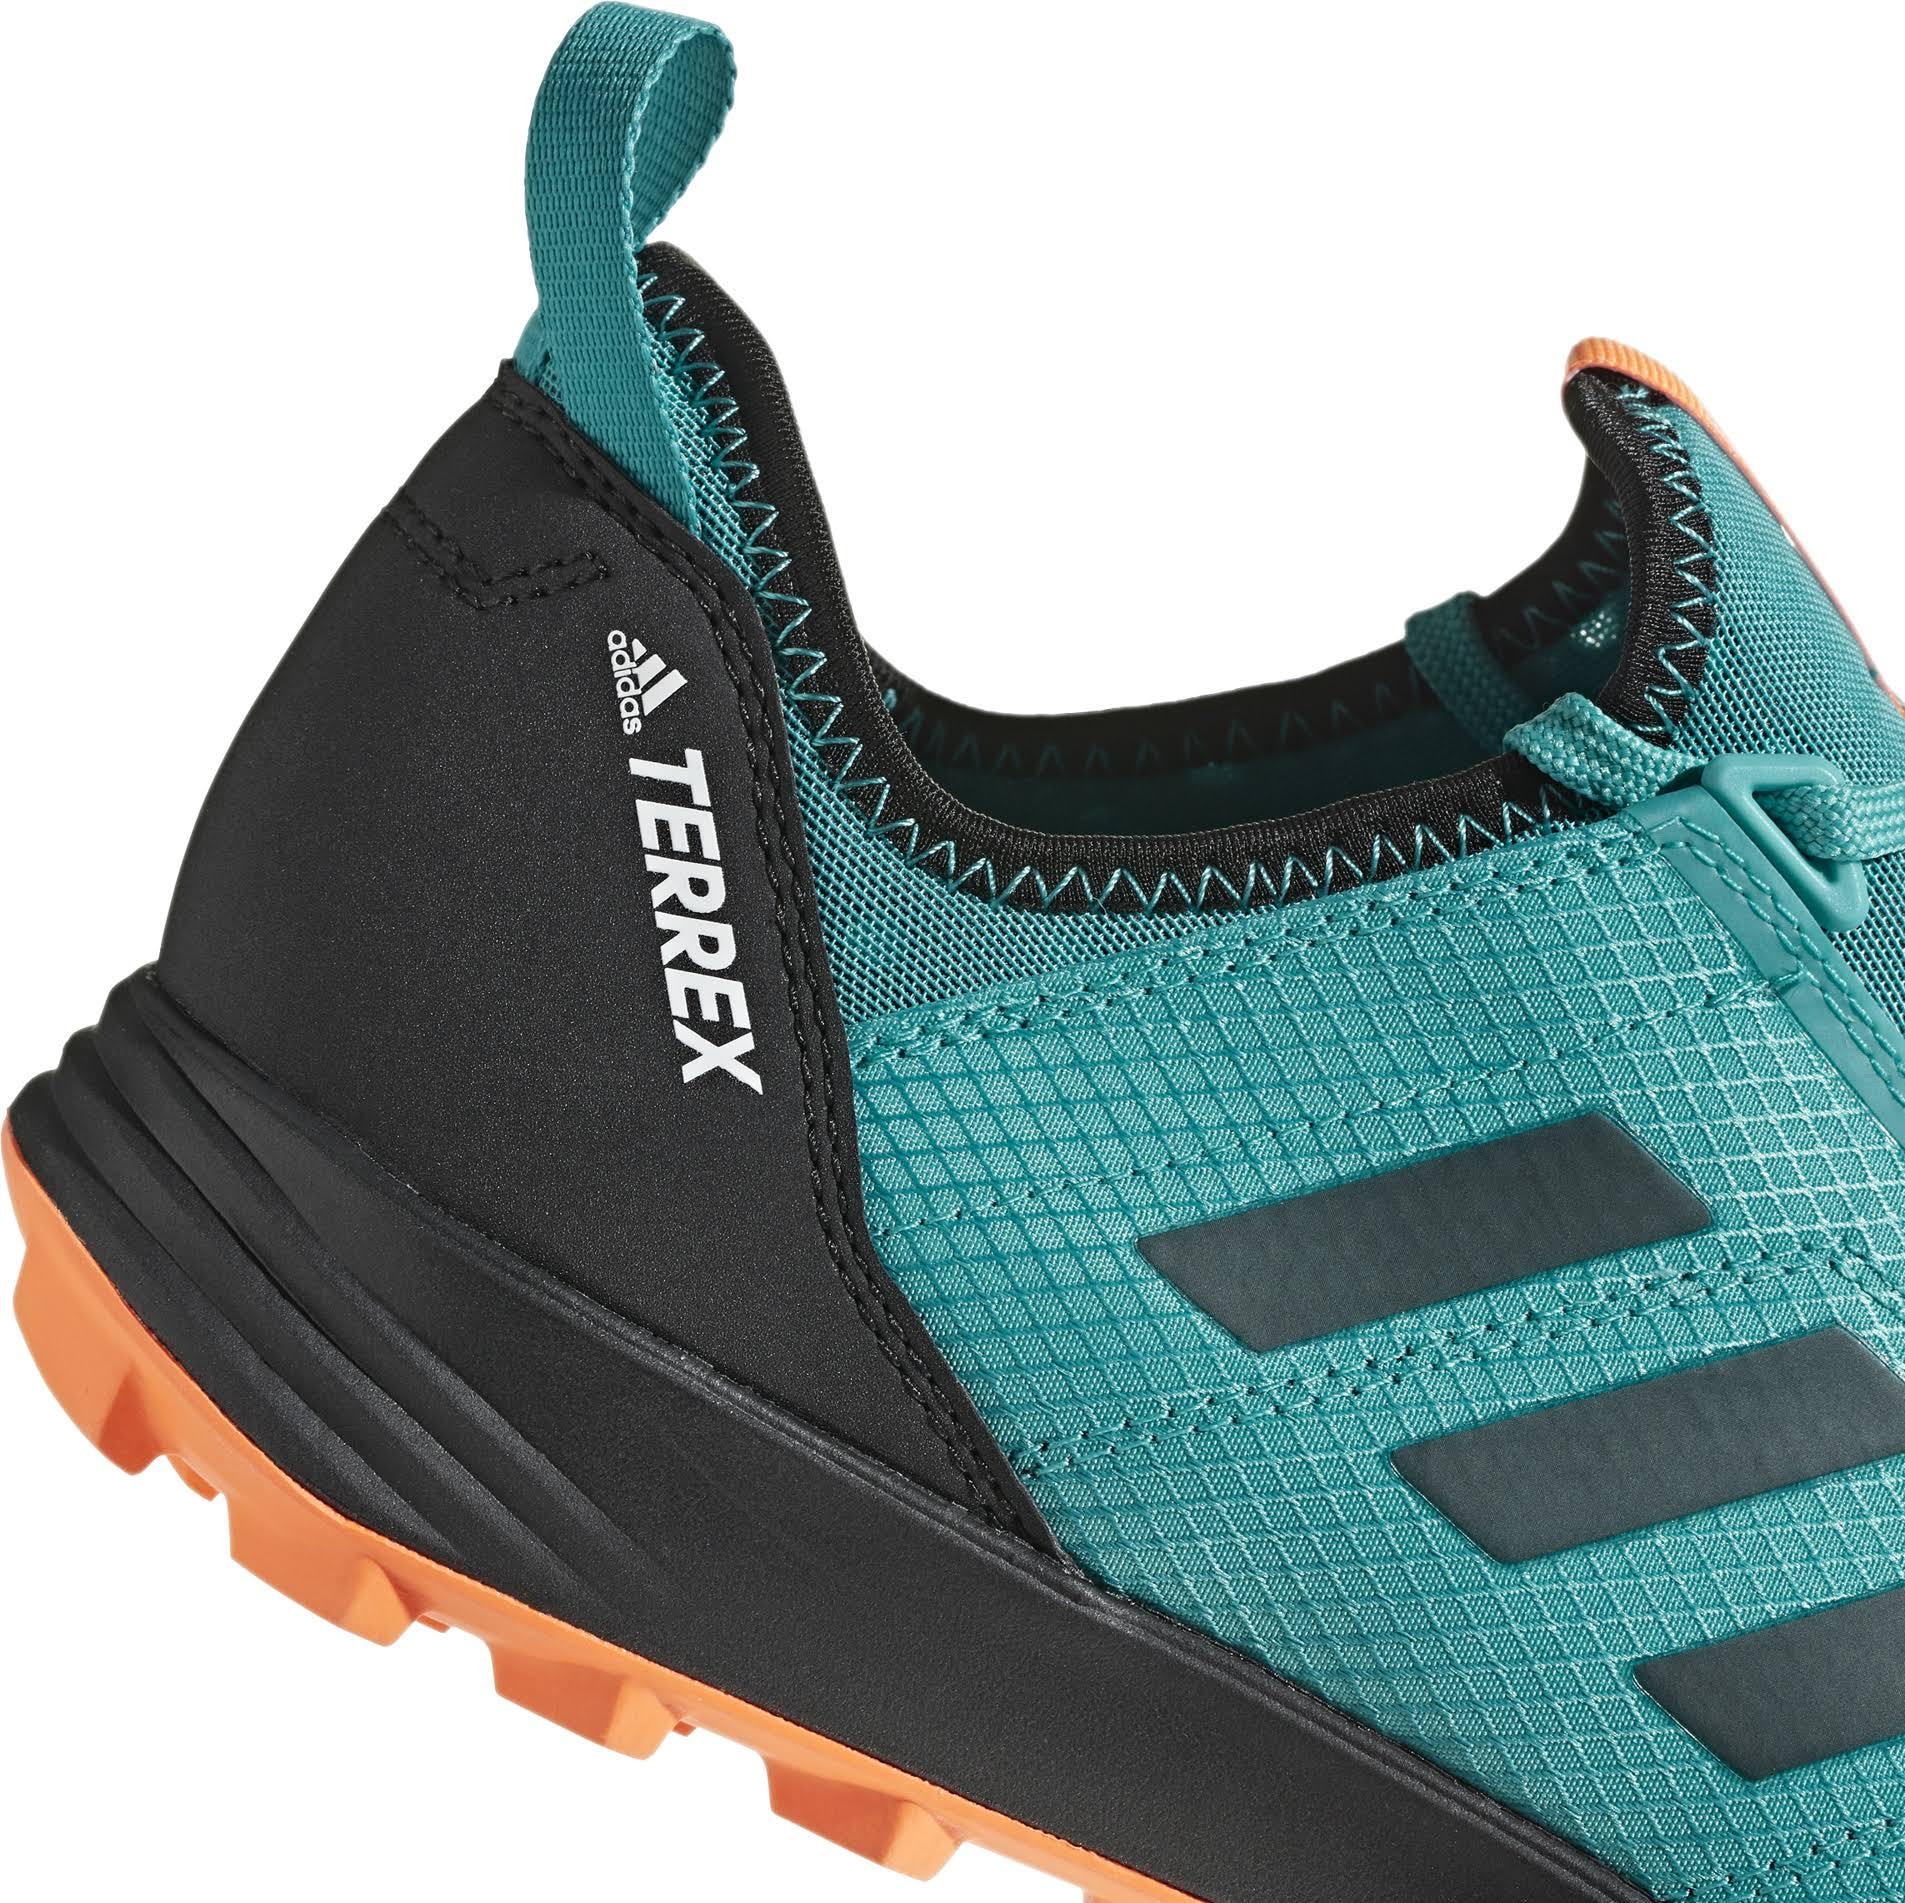 De 40 Agravic Speed trail Terrex Turquesa Zapatillas Running Naranja Adidas gxzwPqddU